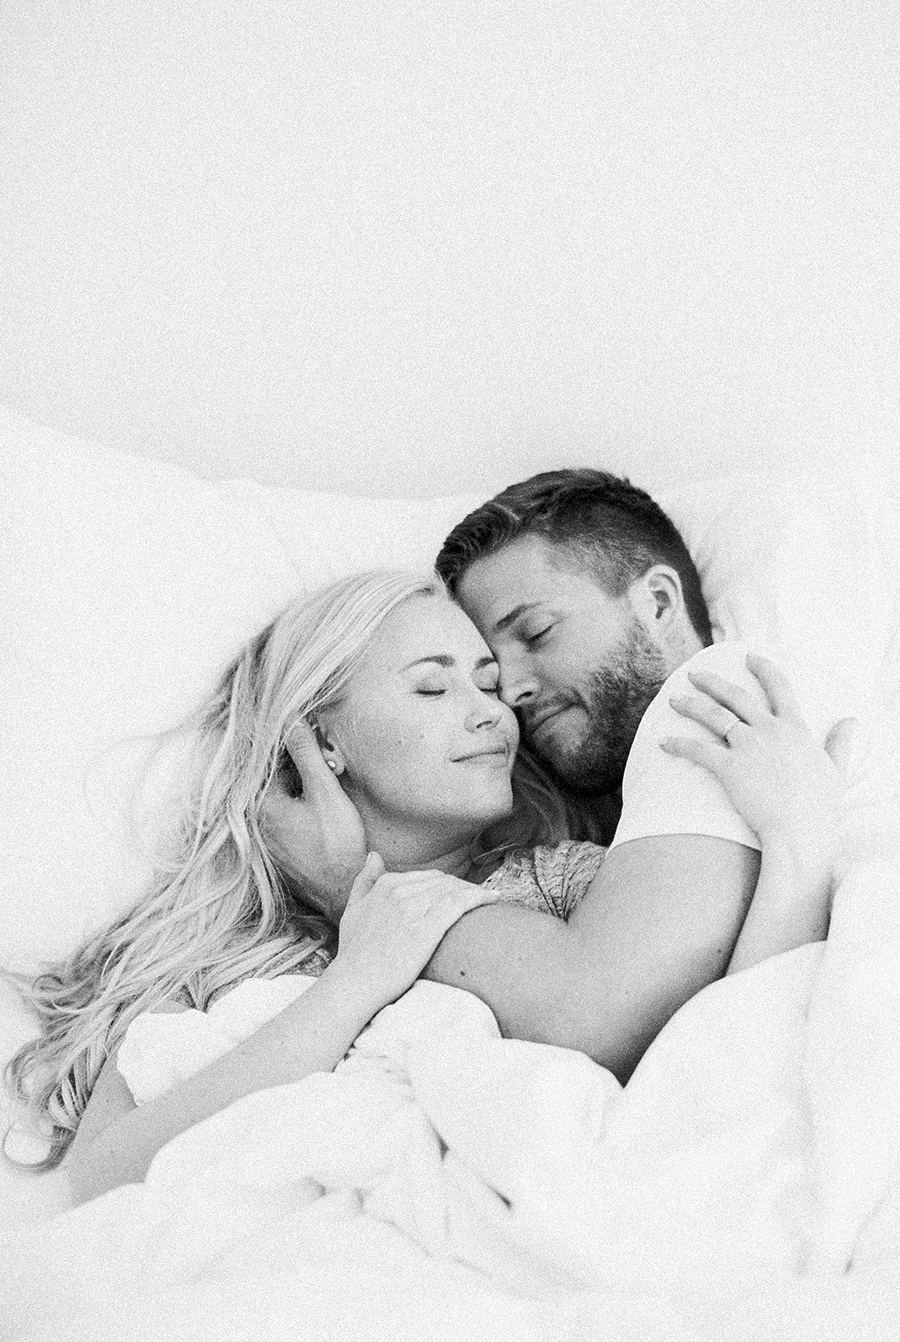 Morning at home couple session parikuvaus kihlakuvaus (43).jpg